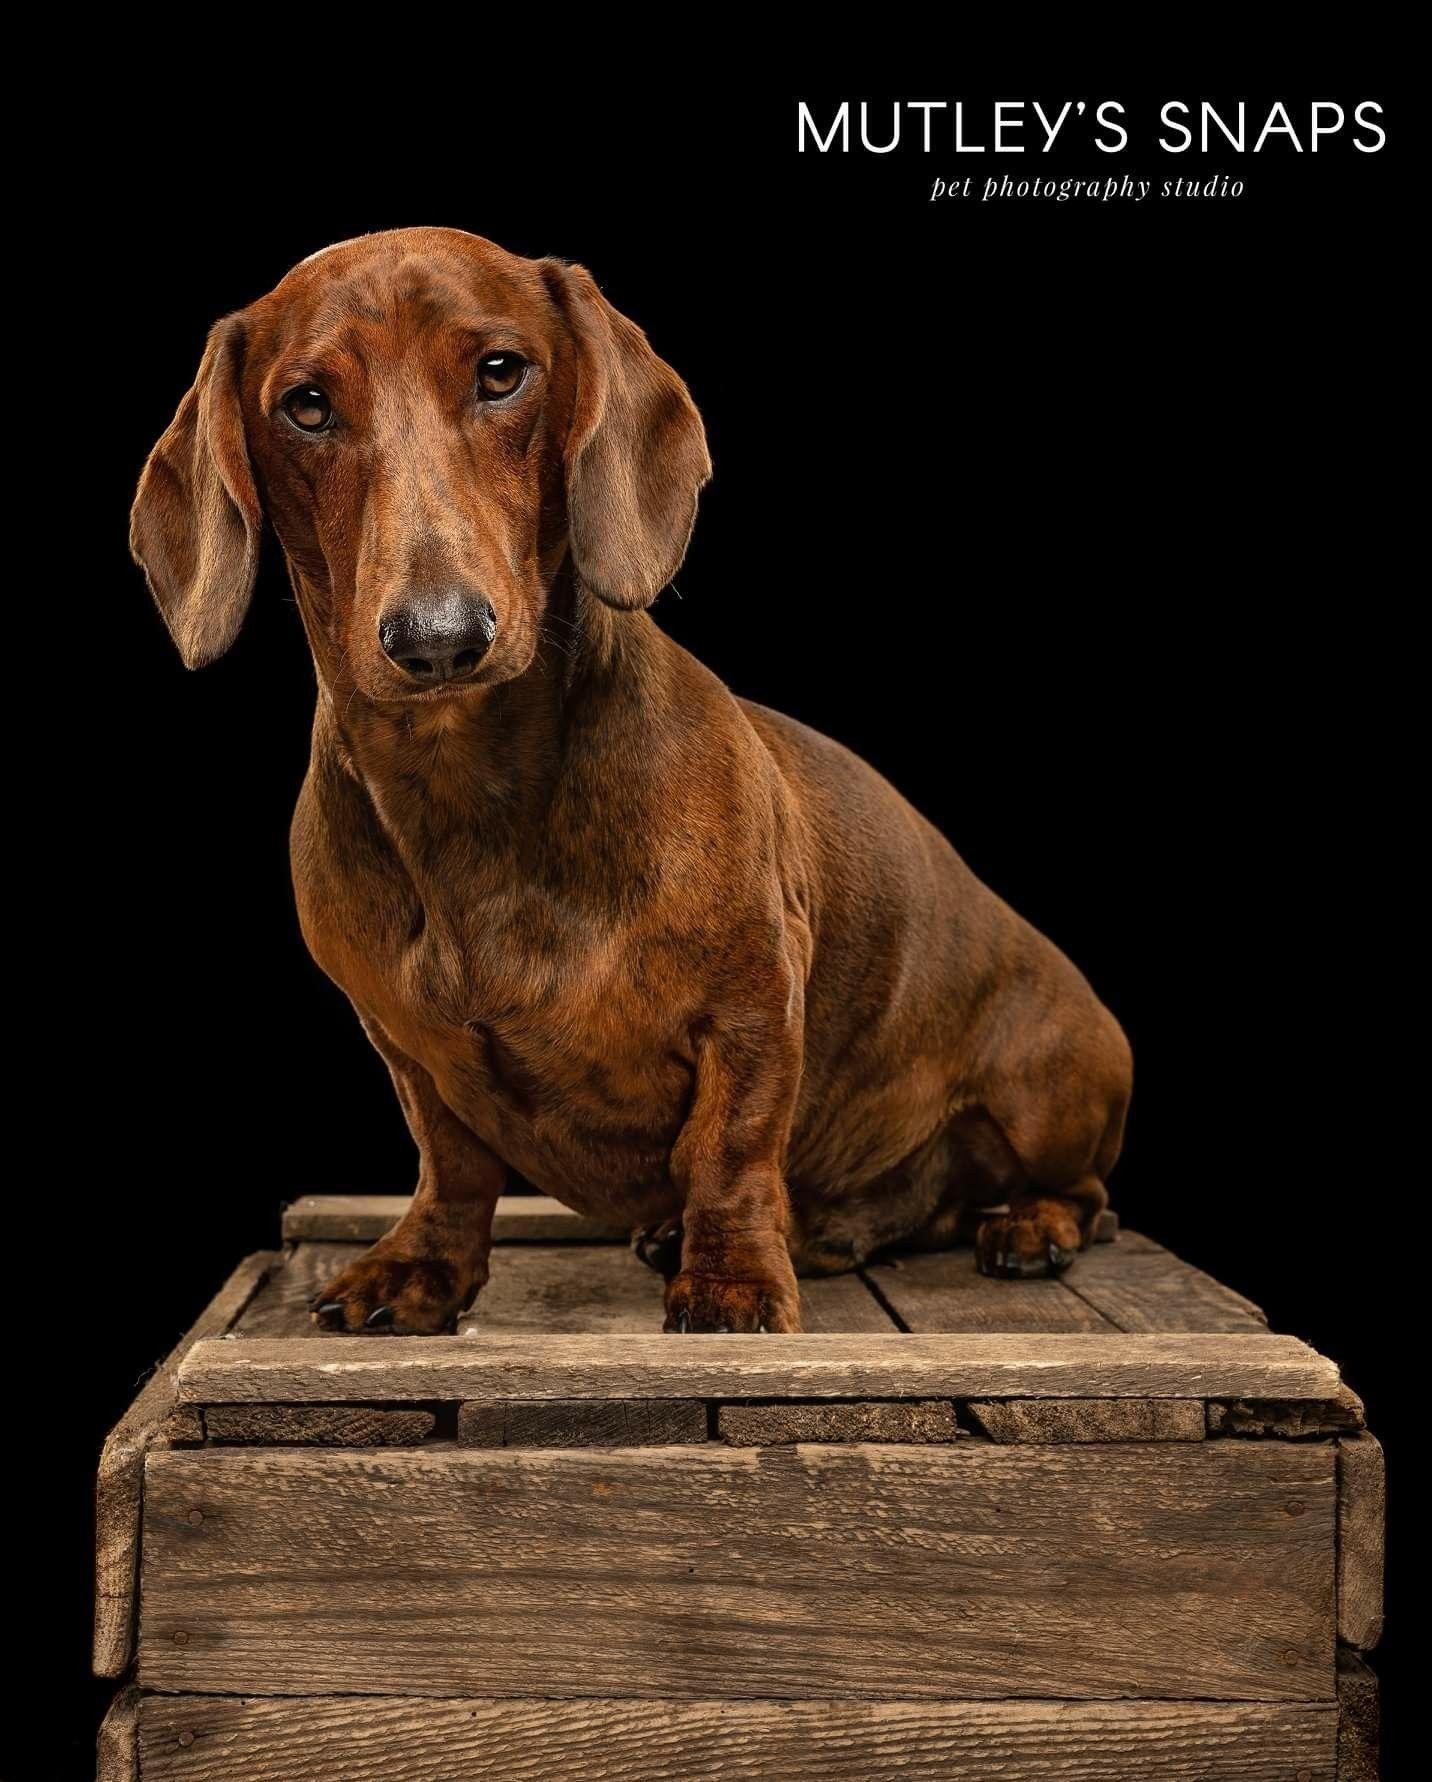 Dachshund Dachshund Dog Cat Pet Photography Studio